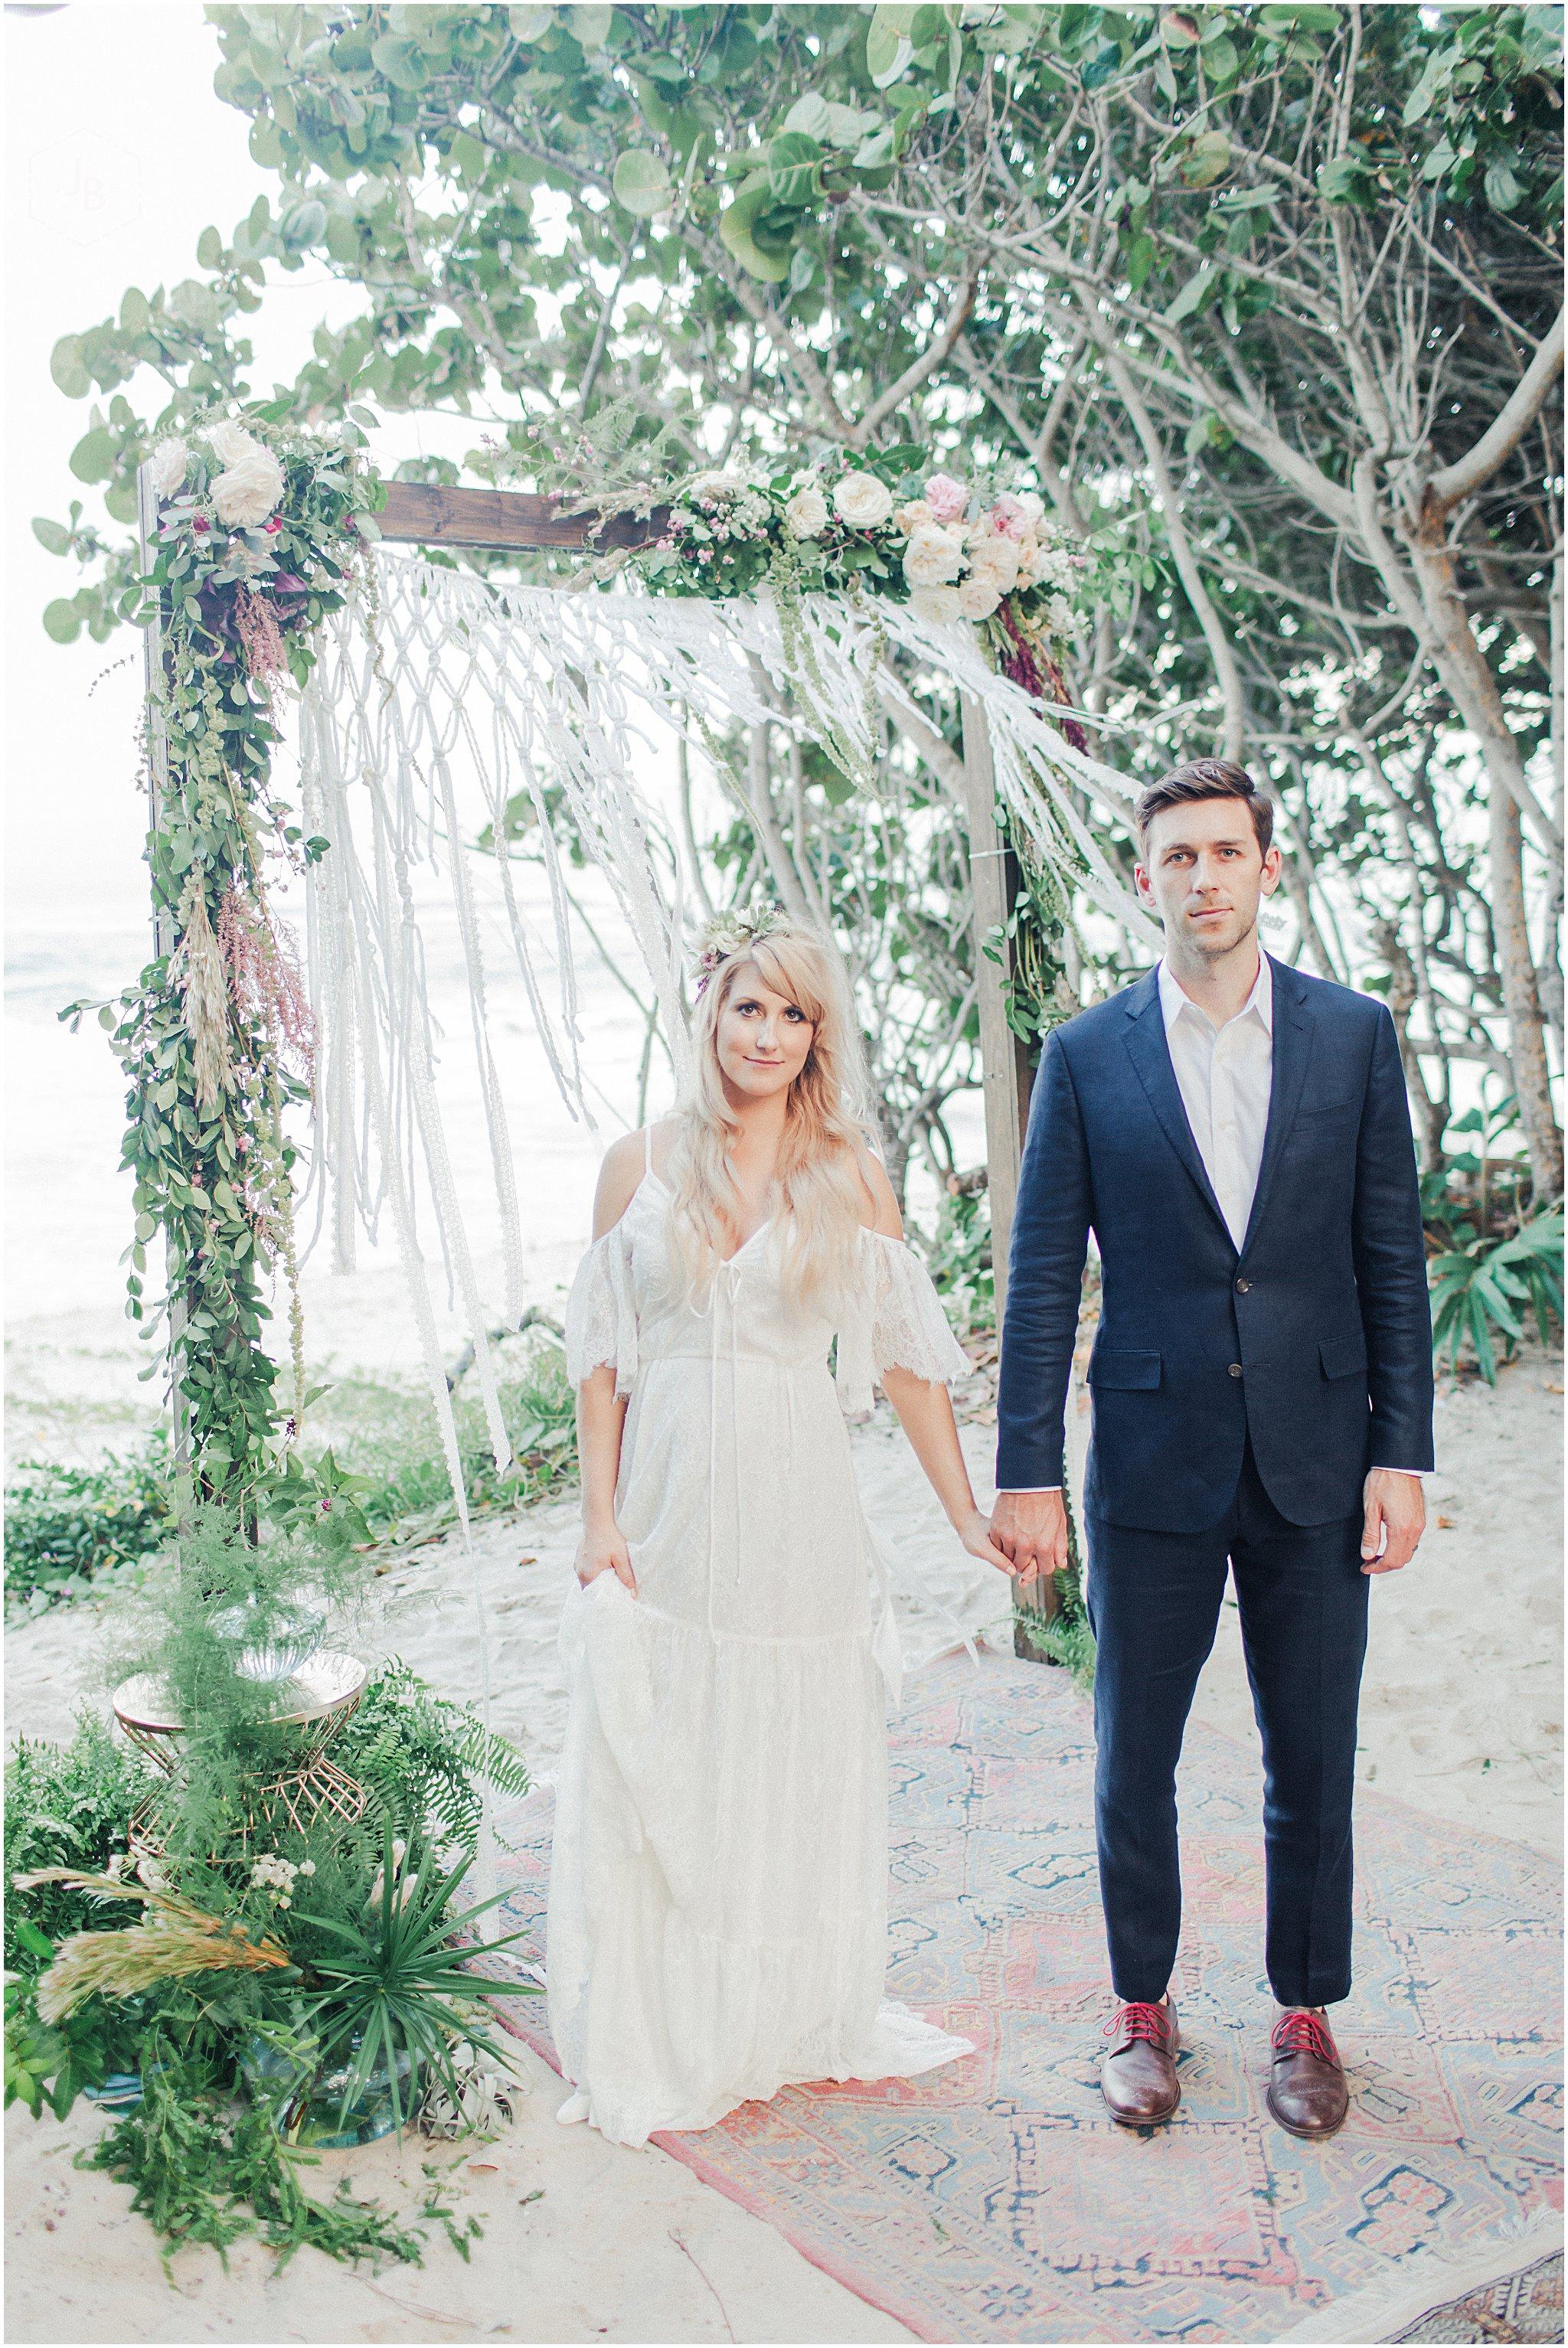 WeddingandEngagementFloridaPhotographer_1356.jpg